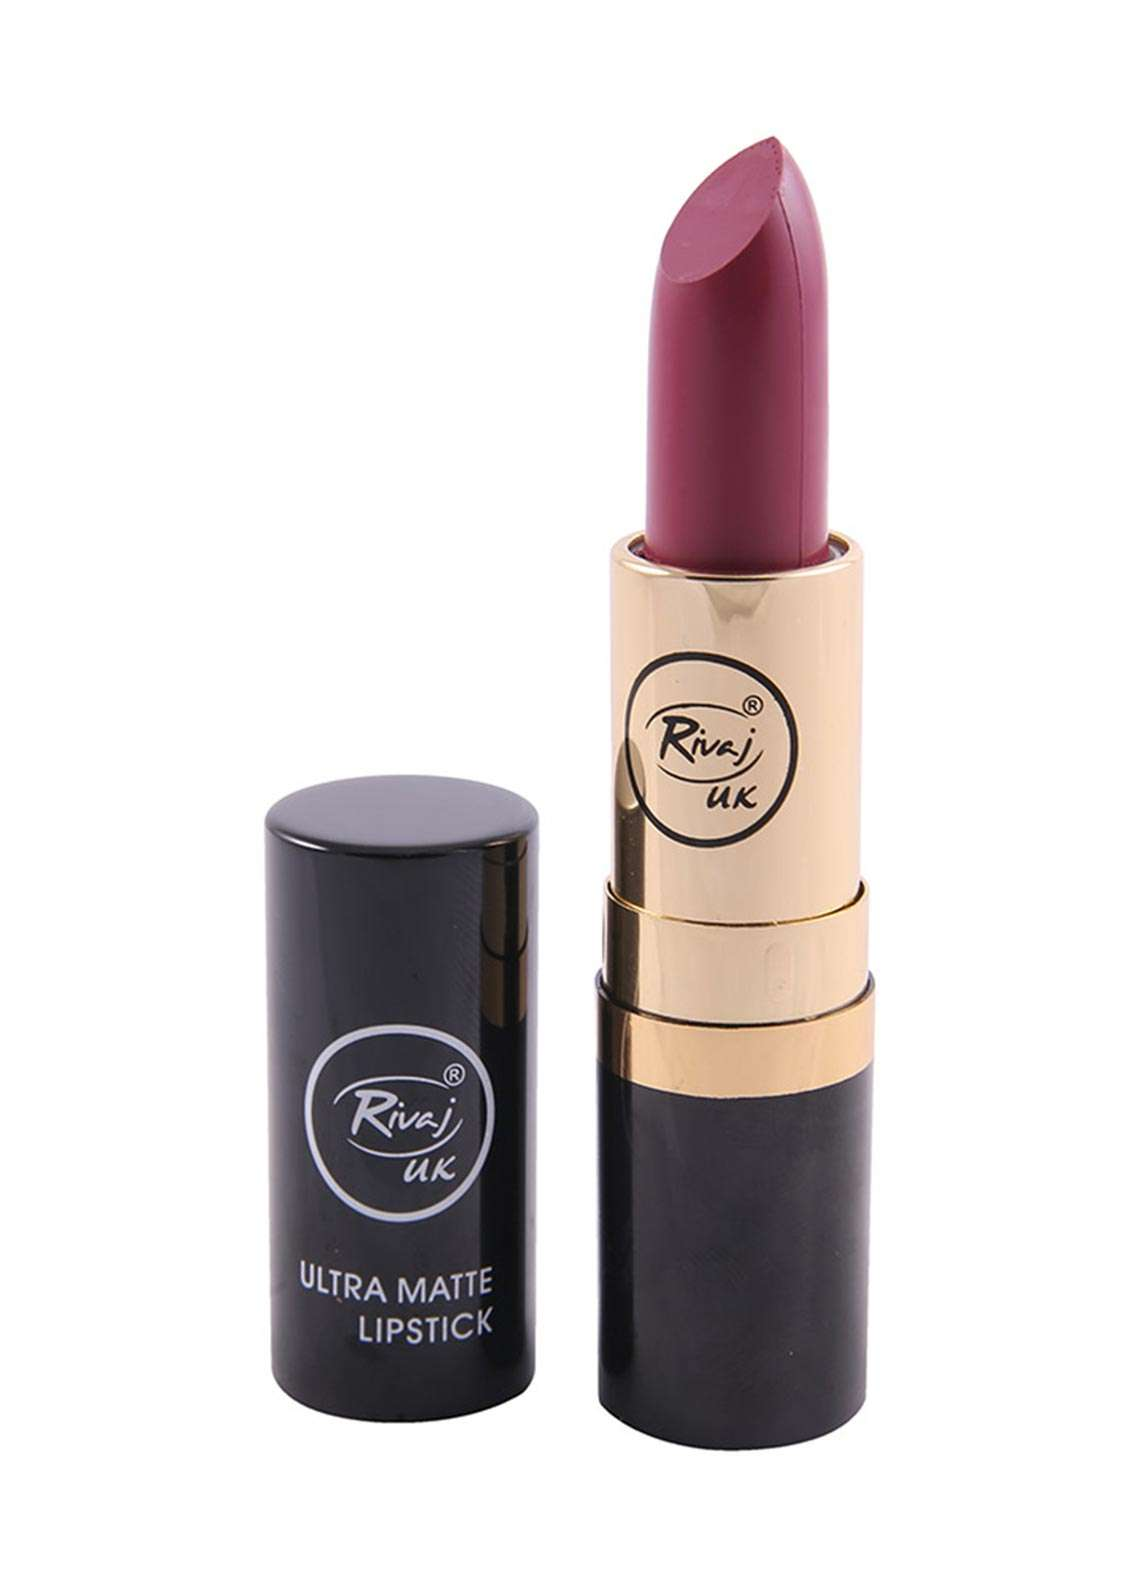 Rivaj UK Ultra Matte Lipstick - 19